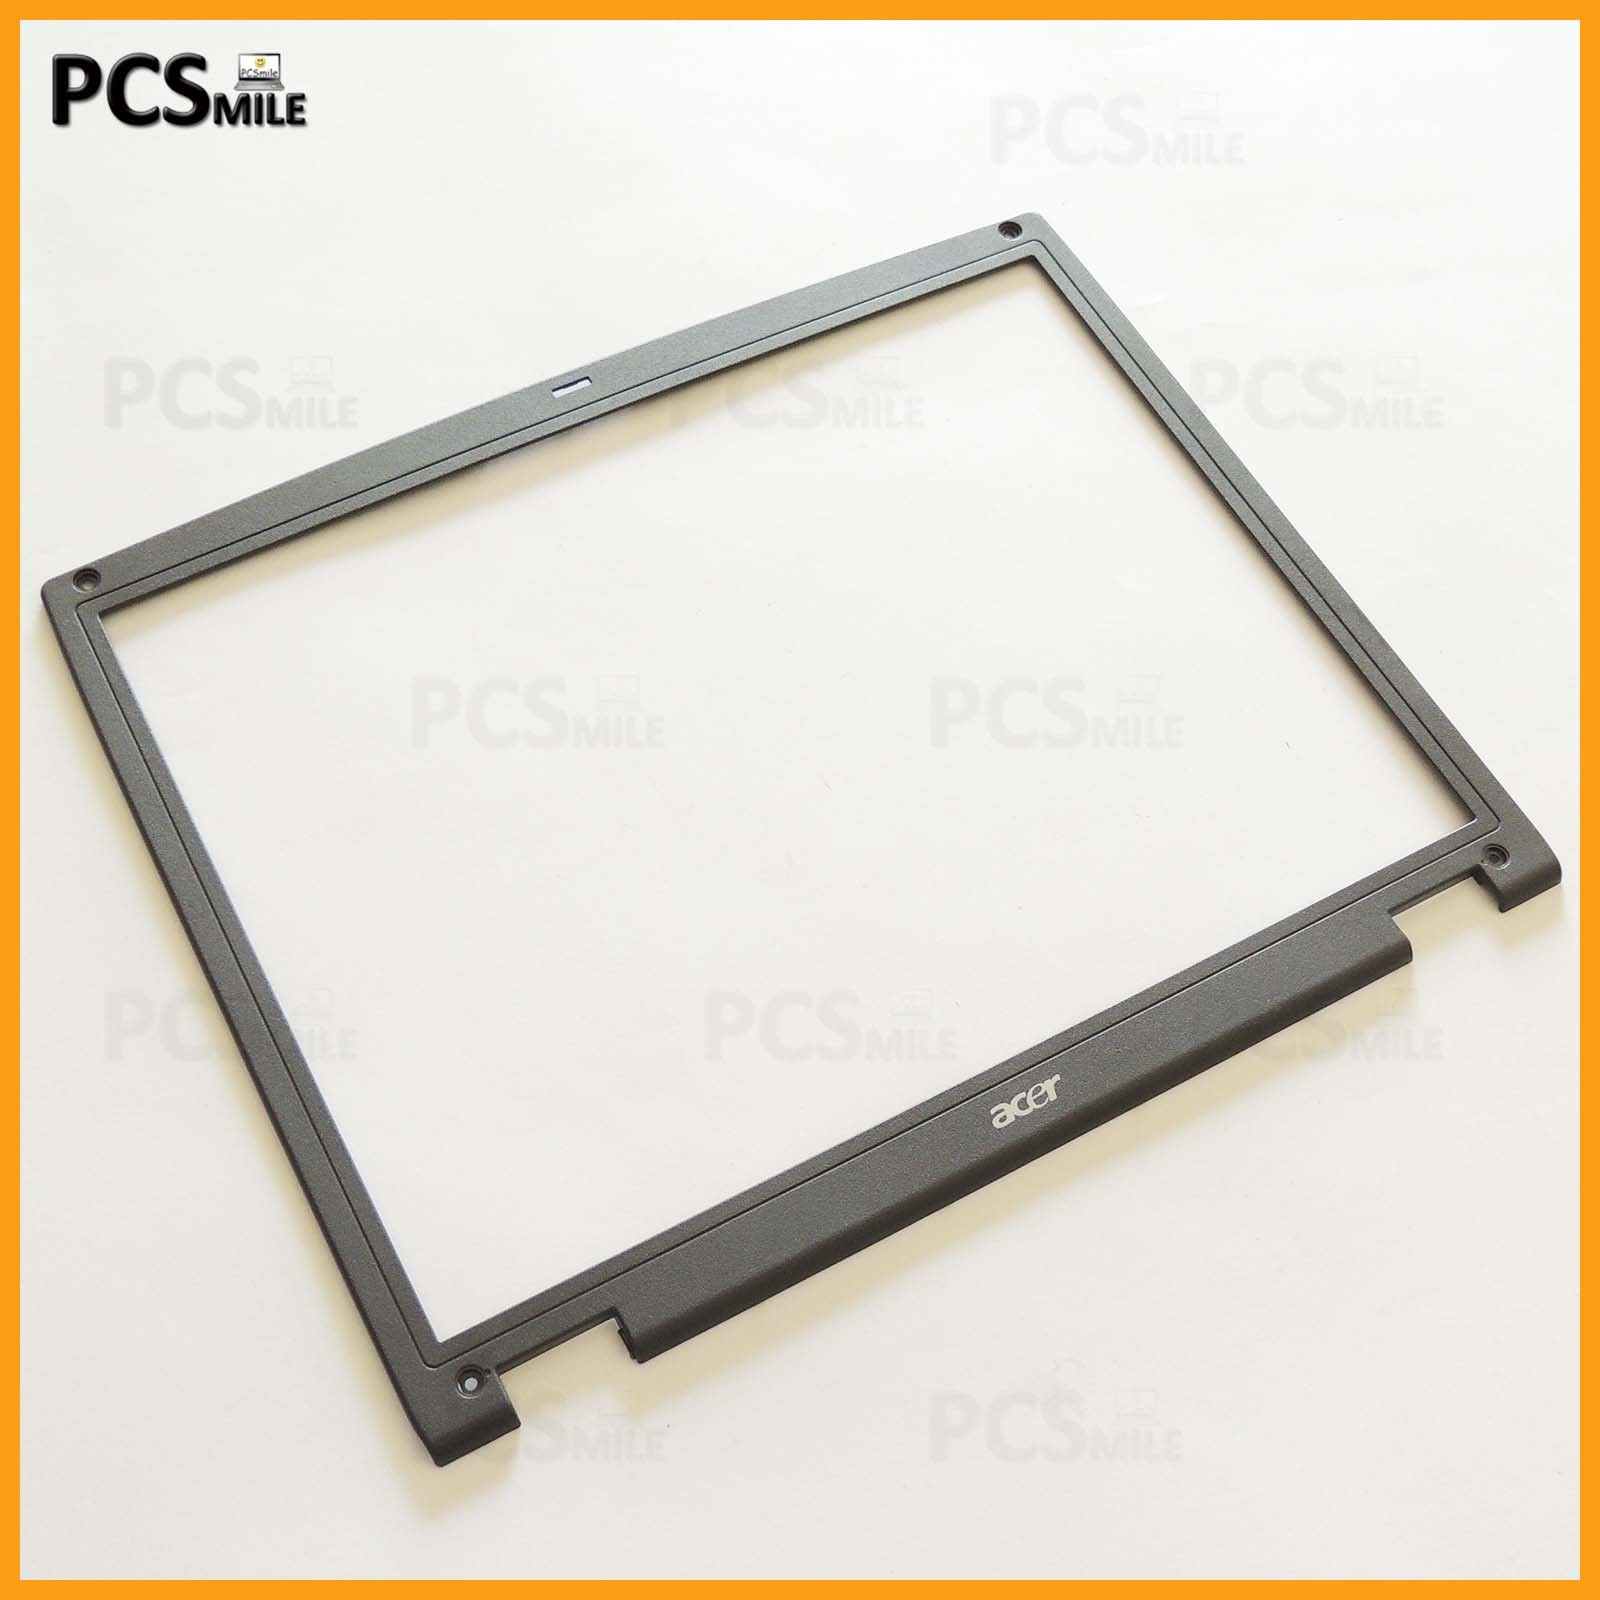 Cornice display Acer 290E Series APCL5529000 Scocca LCD 292ELMi CL51